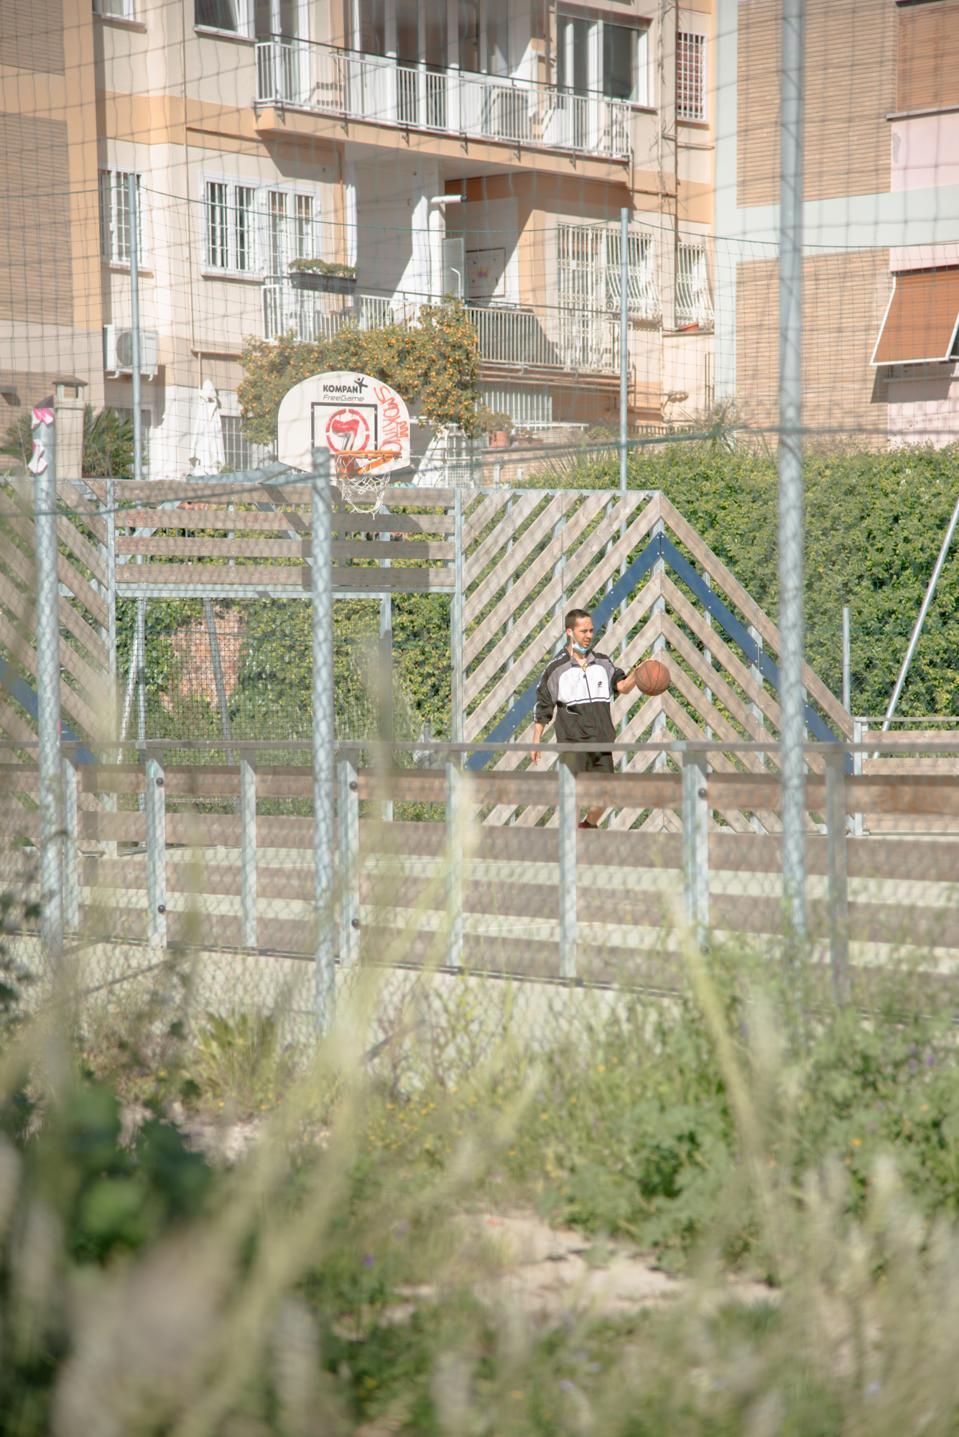 A man plays basketball in post-quarantine Rome.